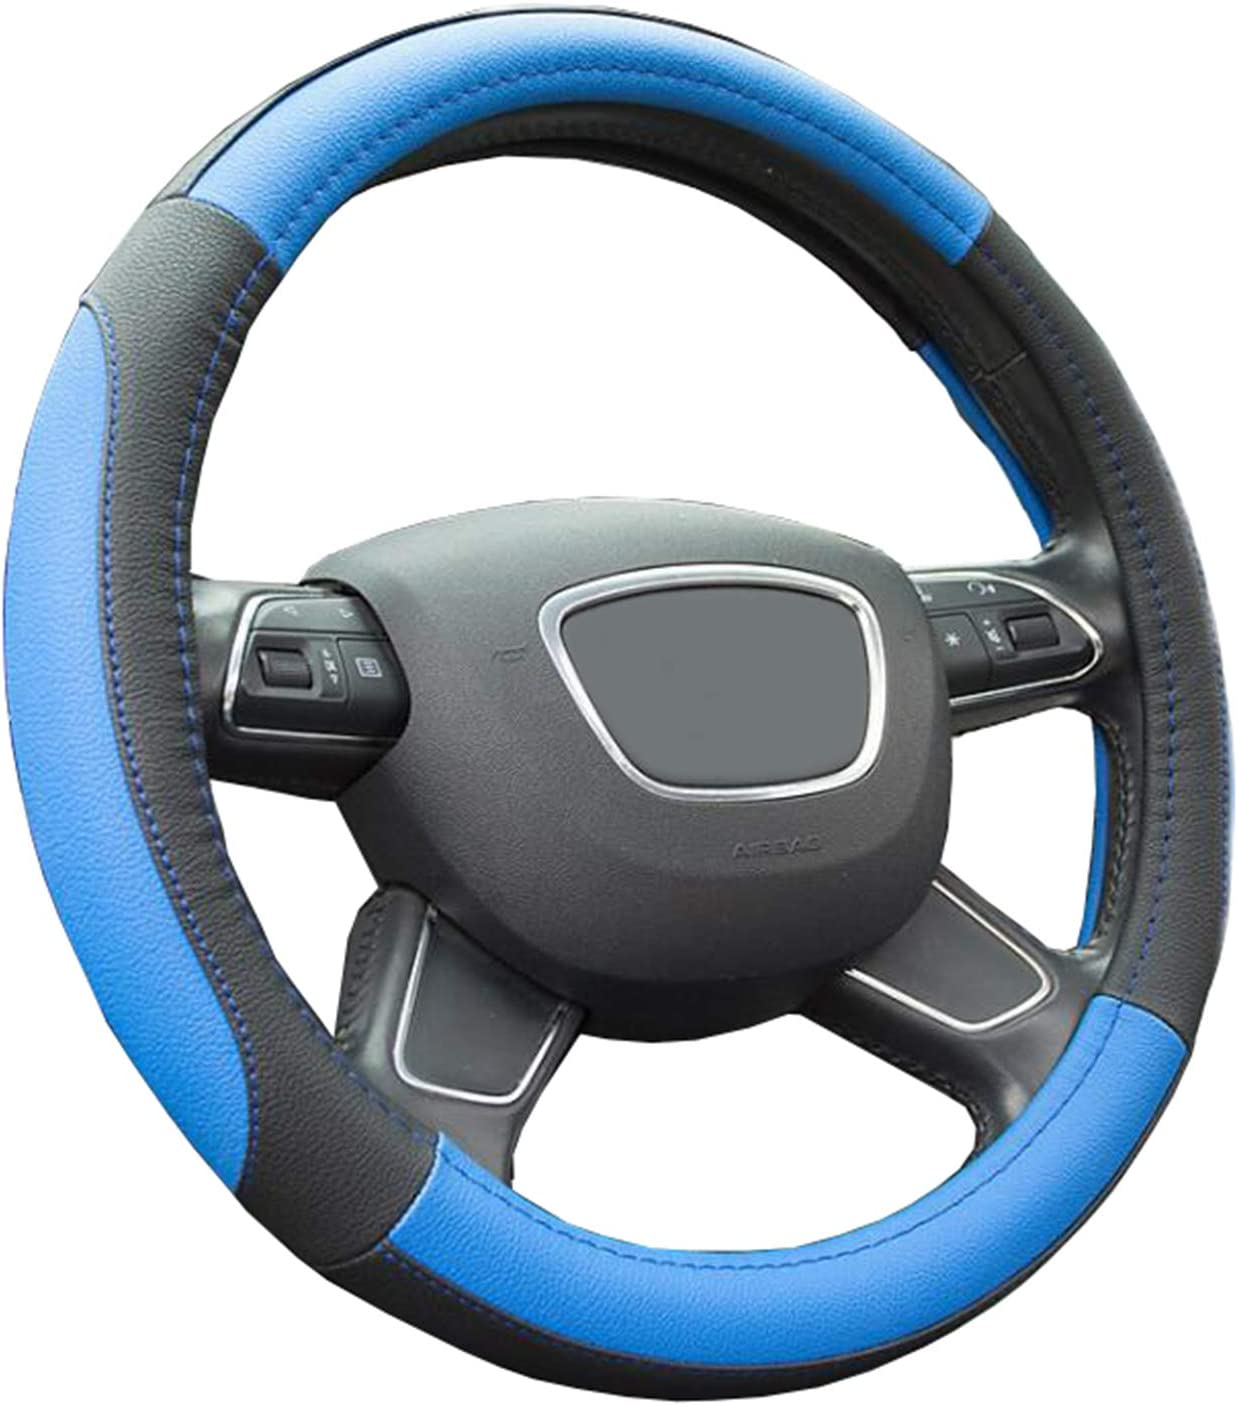 Finoki Auto Universal Anti Rutsch Atmungsaktive Lenkradhülle Lenkradbezug Lenkradschoner Aus Mikrofaser Leder 36 38cm Blau Küche Haushalt